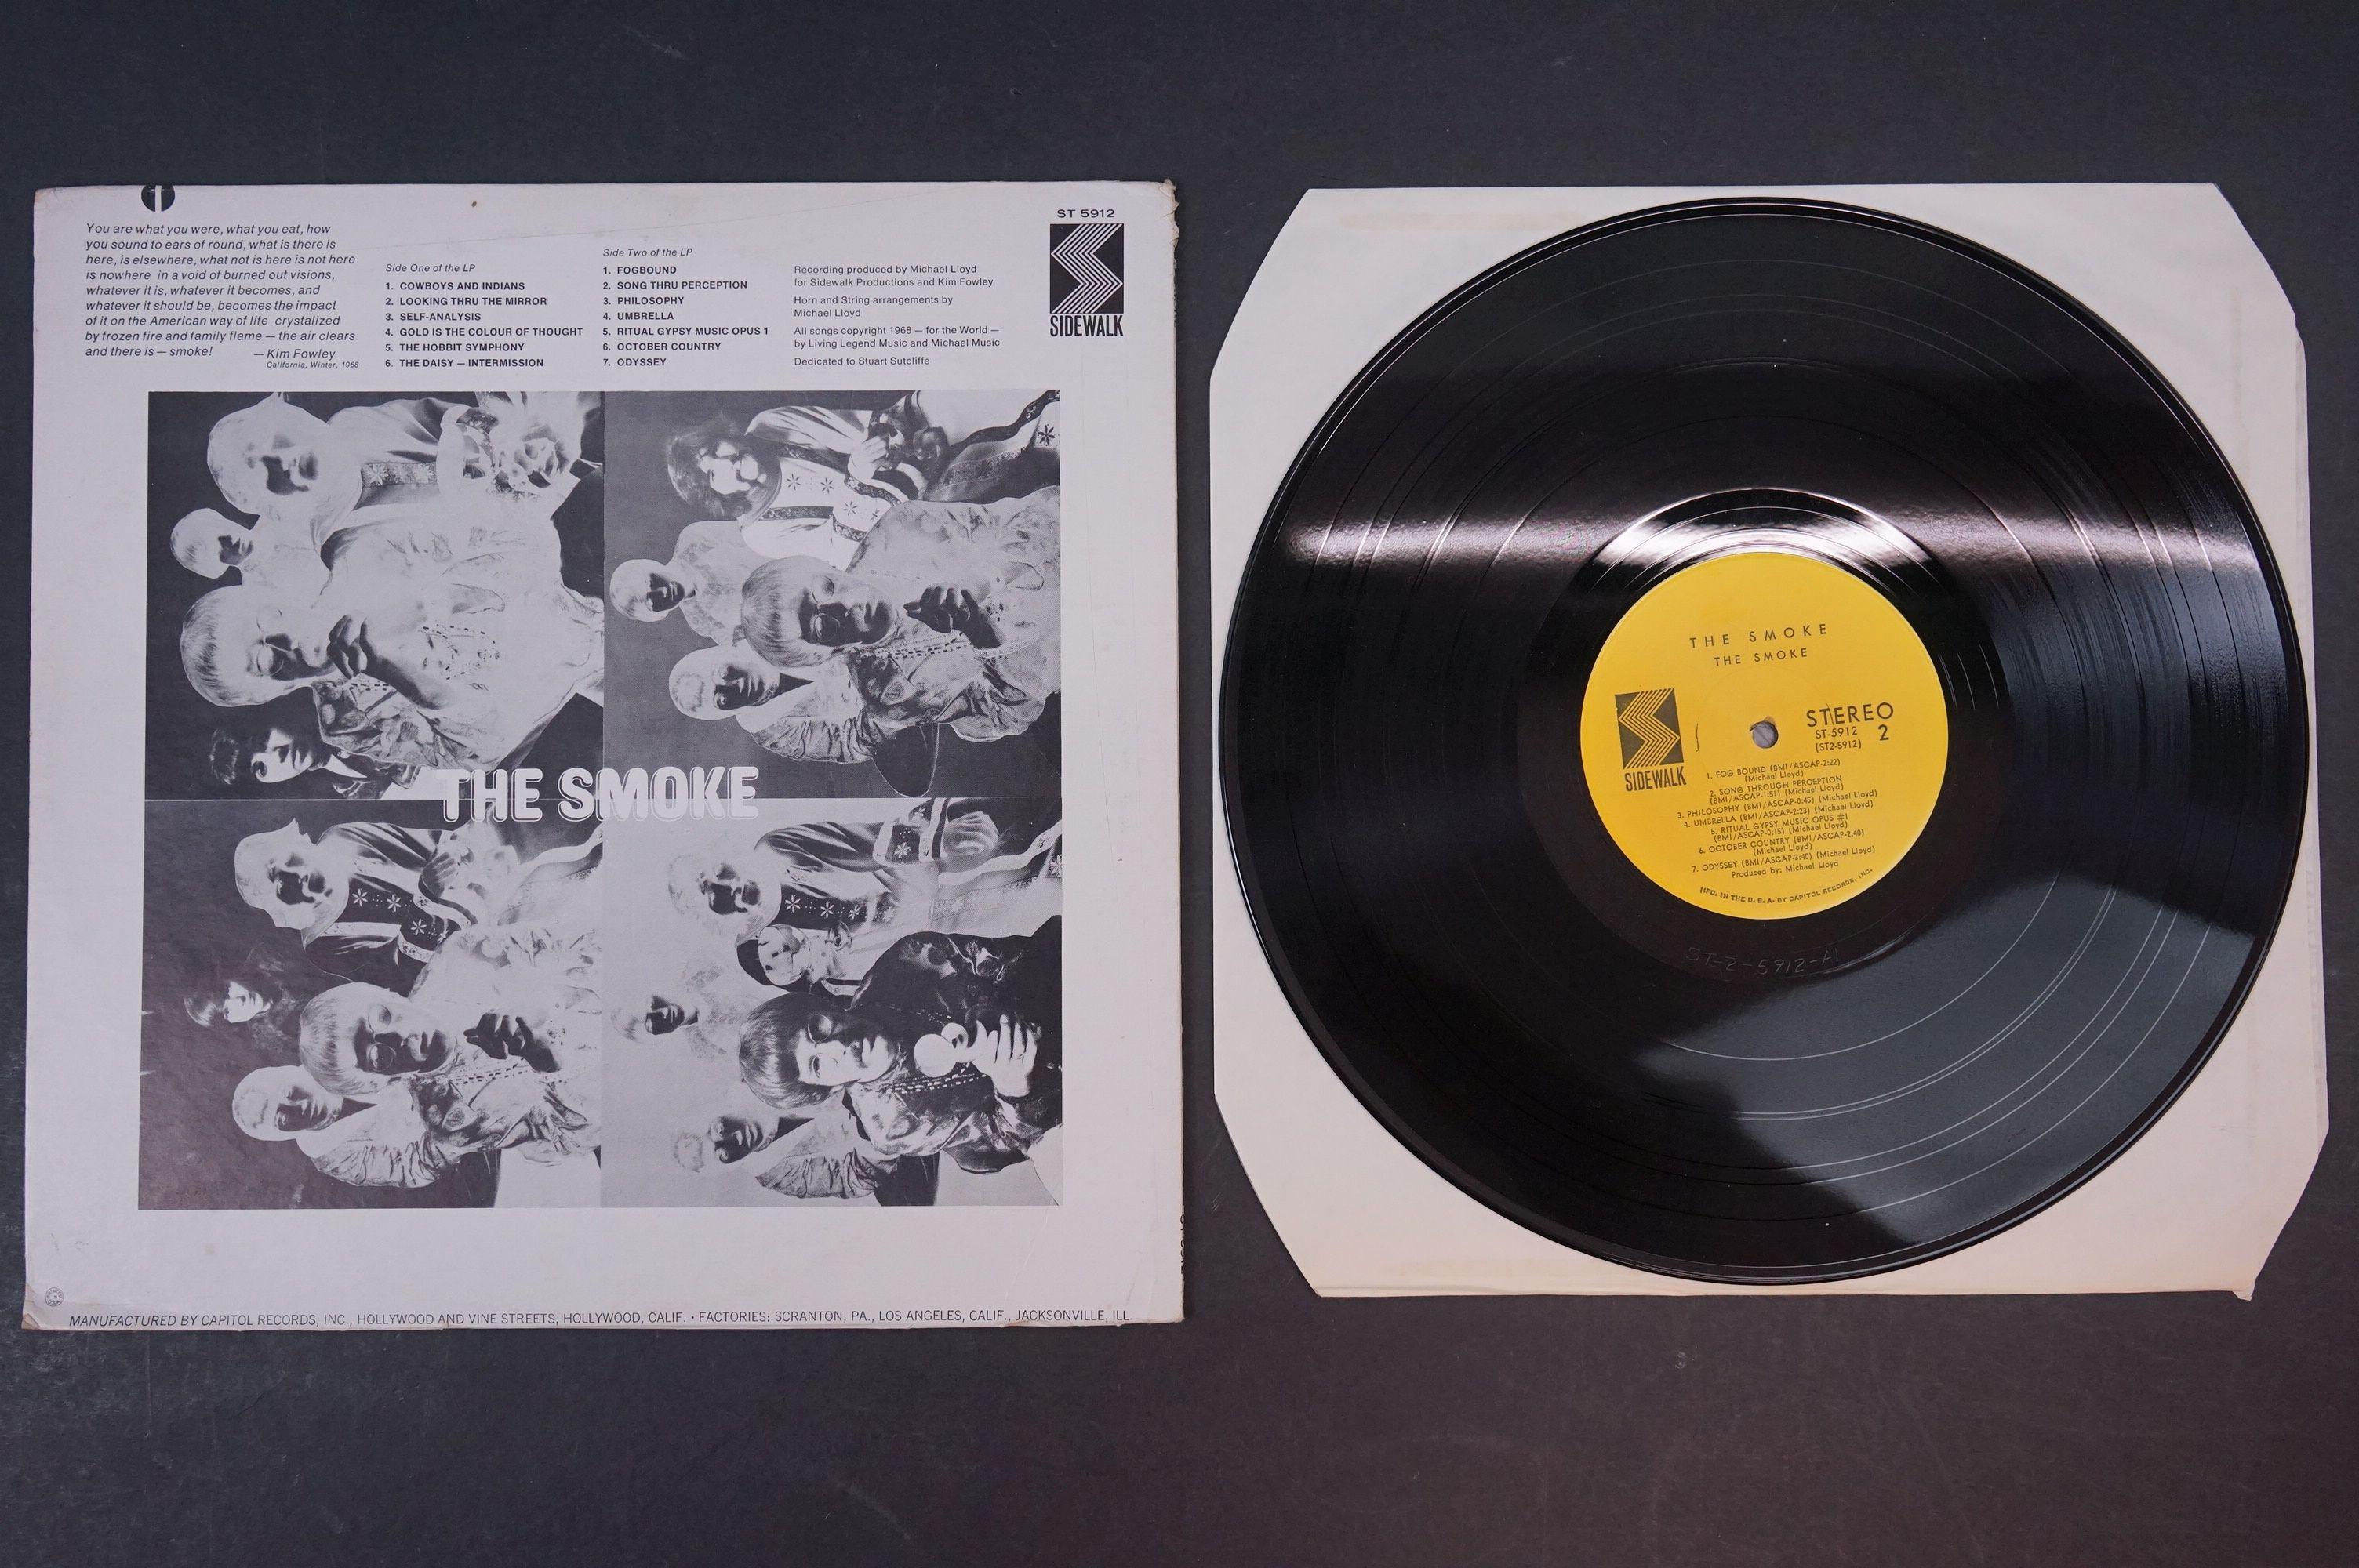 Vinyl - Psych - The Smoke - The Smoke (1968 US, Sidewalk Records) vg+/ex - Image 3 of 3